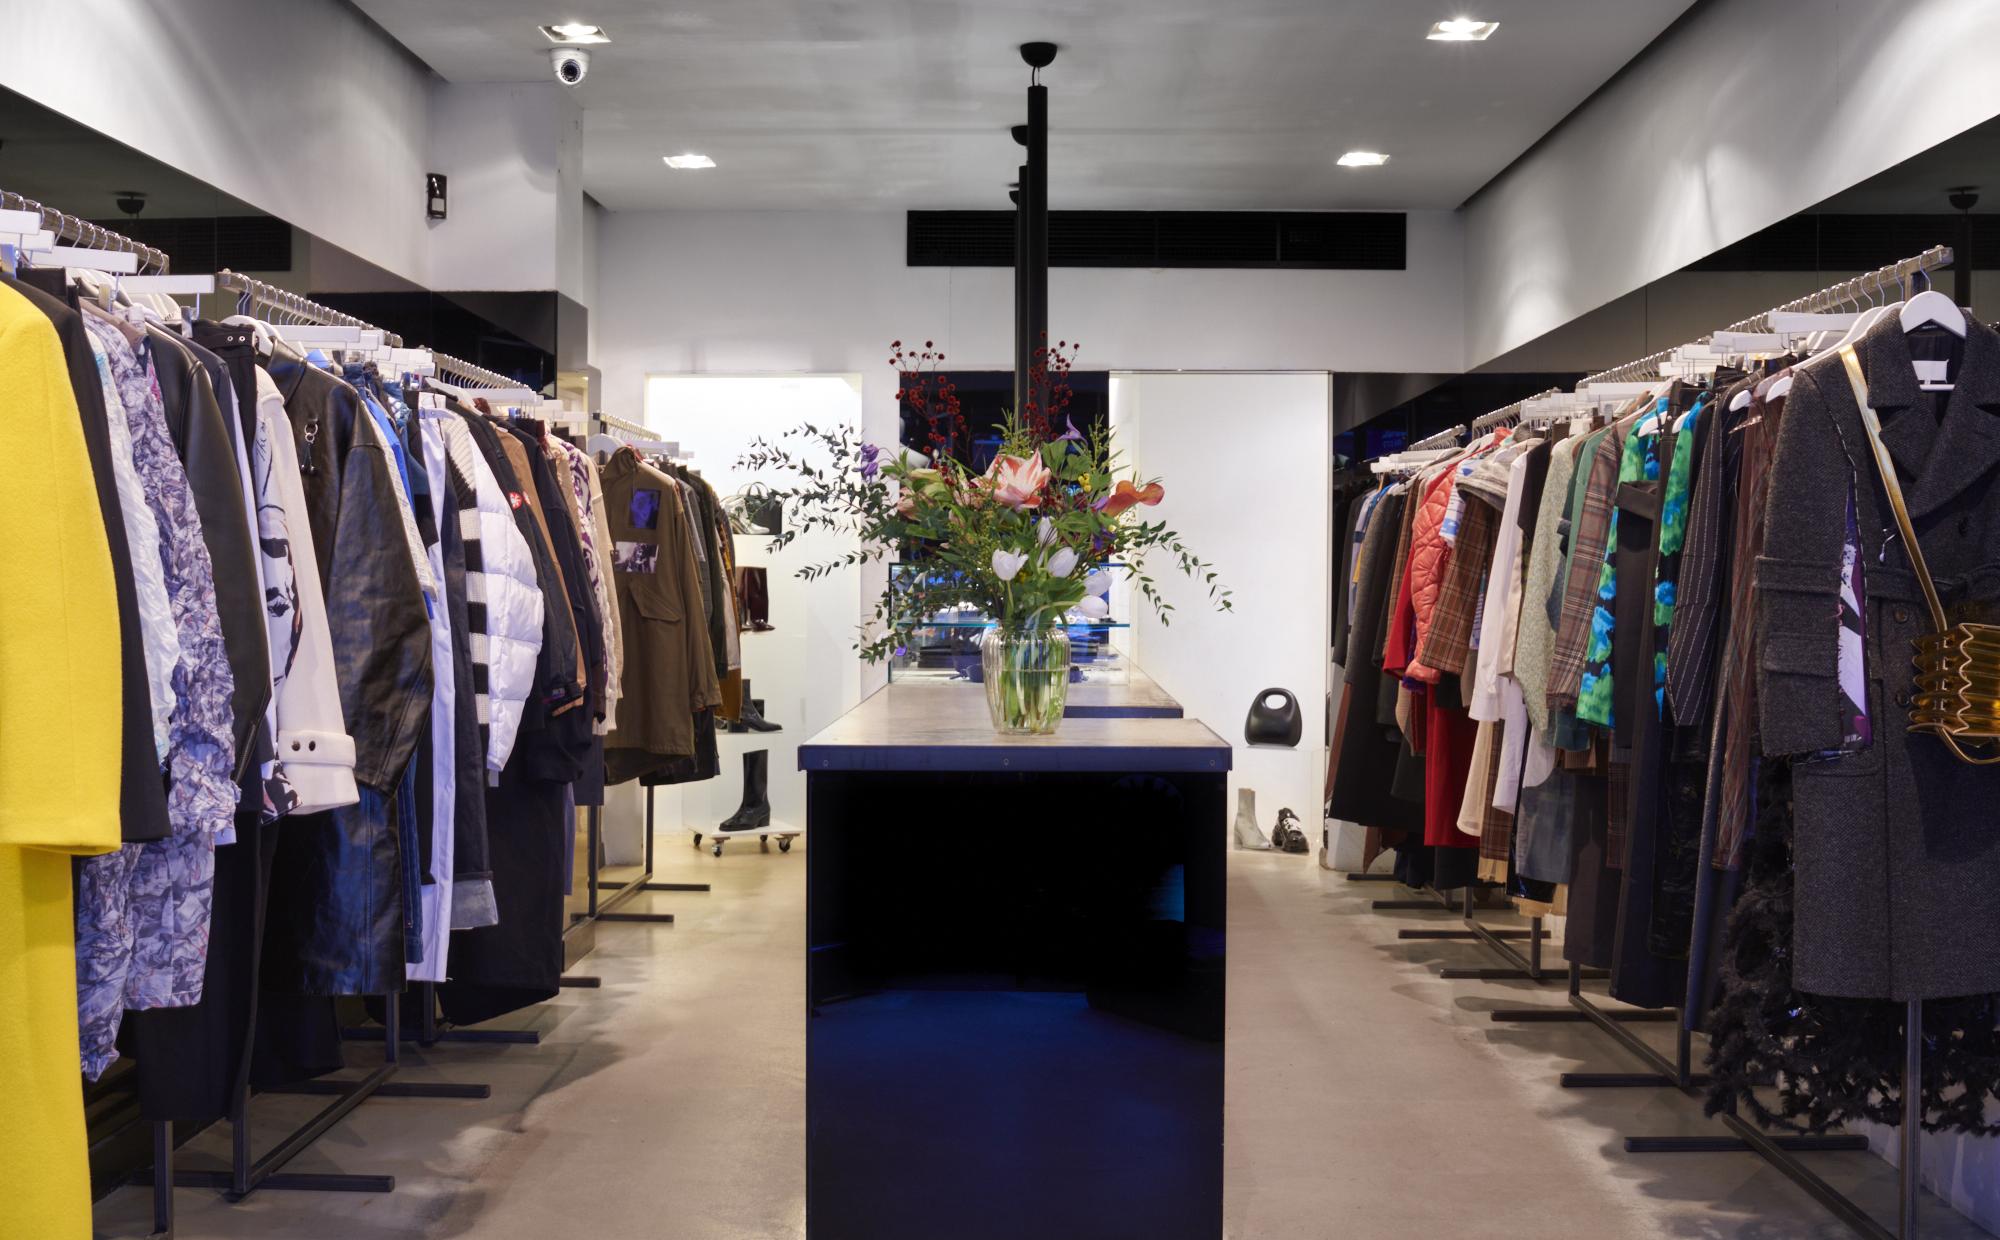 Inside of Machine-A store in Soho, London